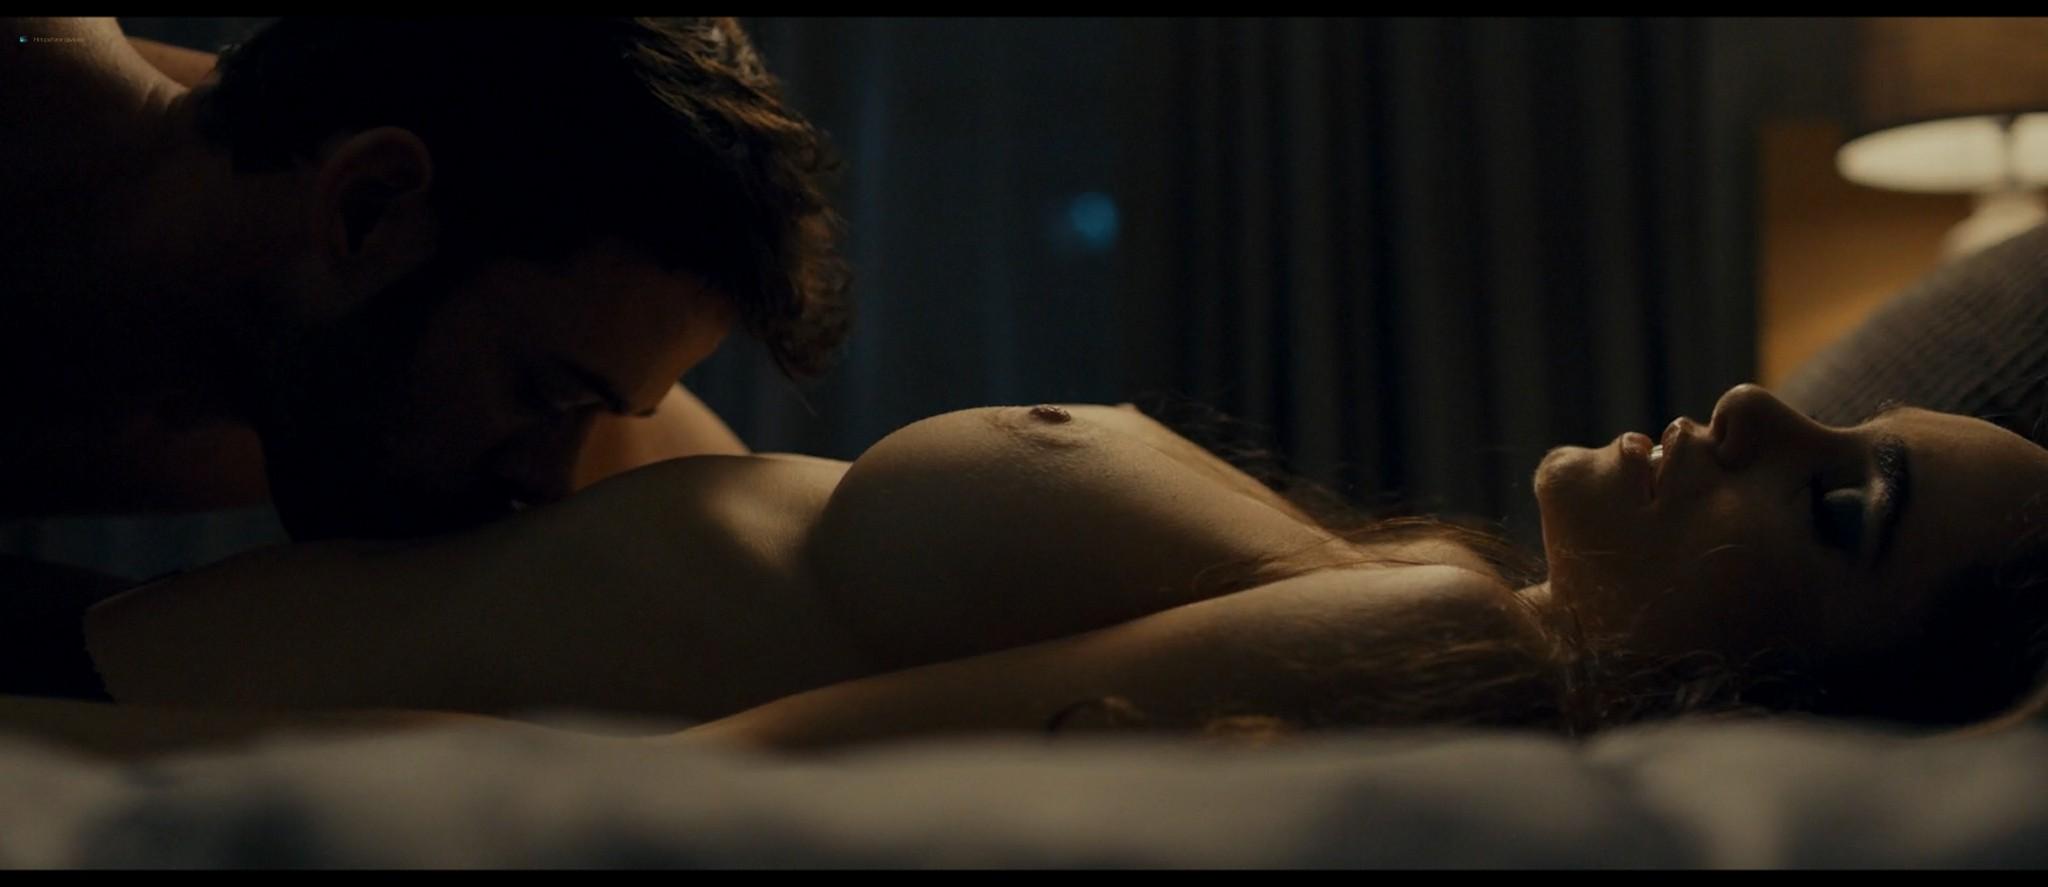 Alicia Sanz nude hot sex - En Brazos de un sesino (2019) HD 1080p Web (4)